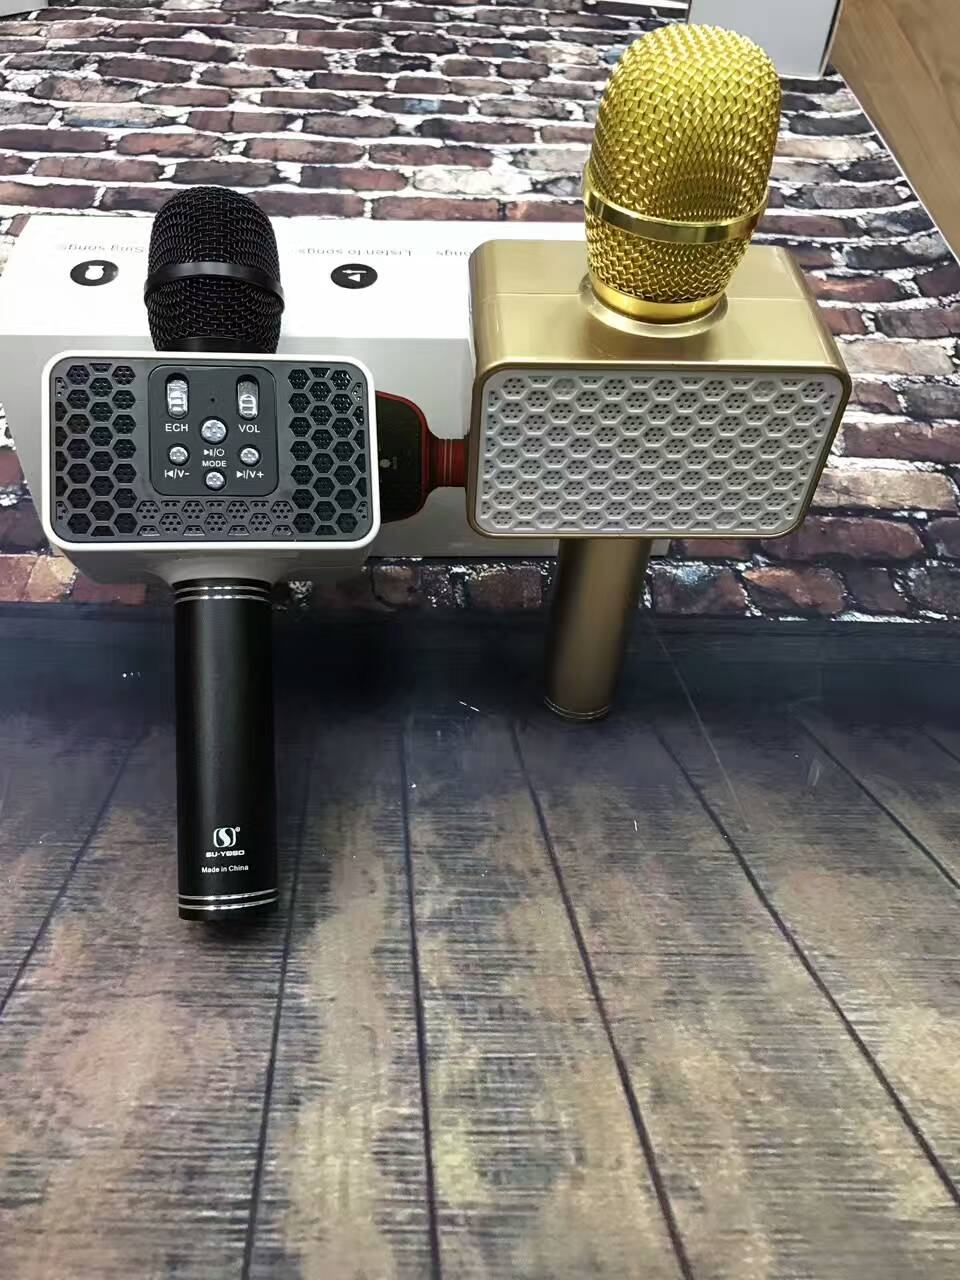 Micro karaoke 3 in 1 : Q7-Q9-YS10-83-84-85 giá sỉ !! - 8